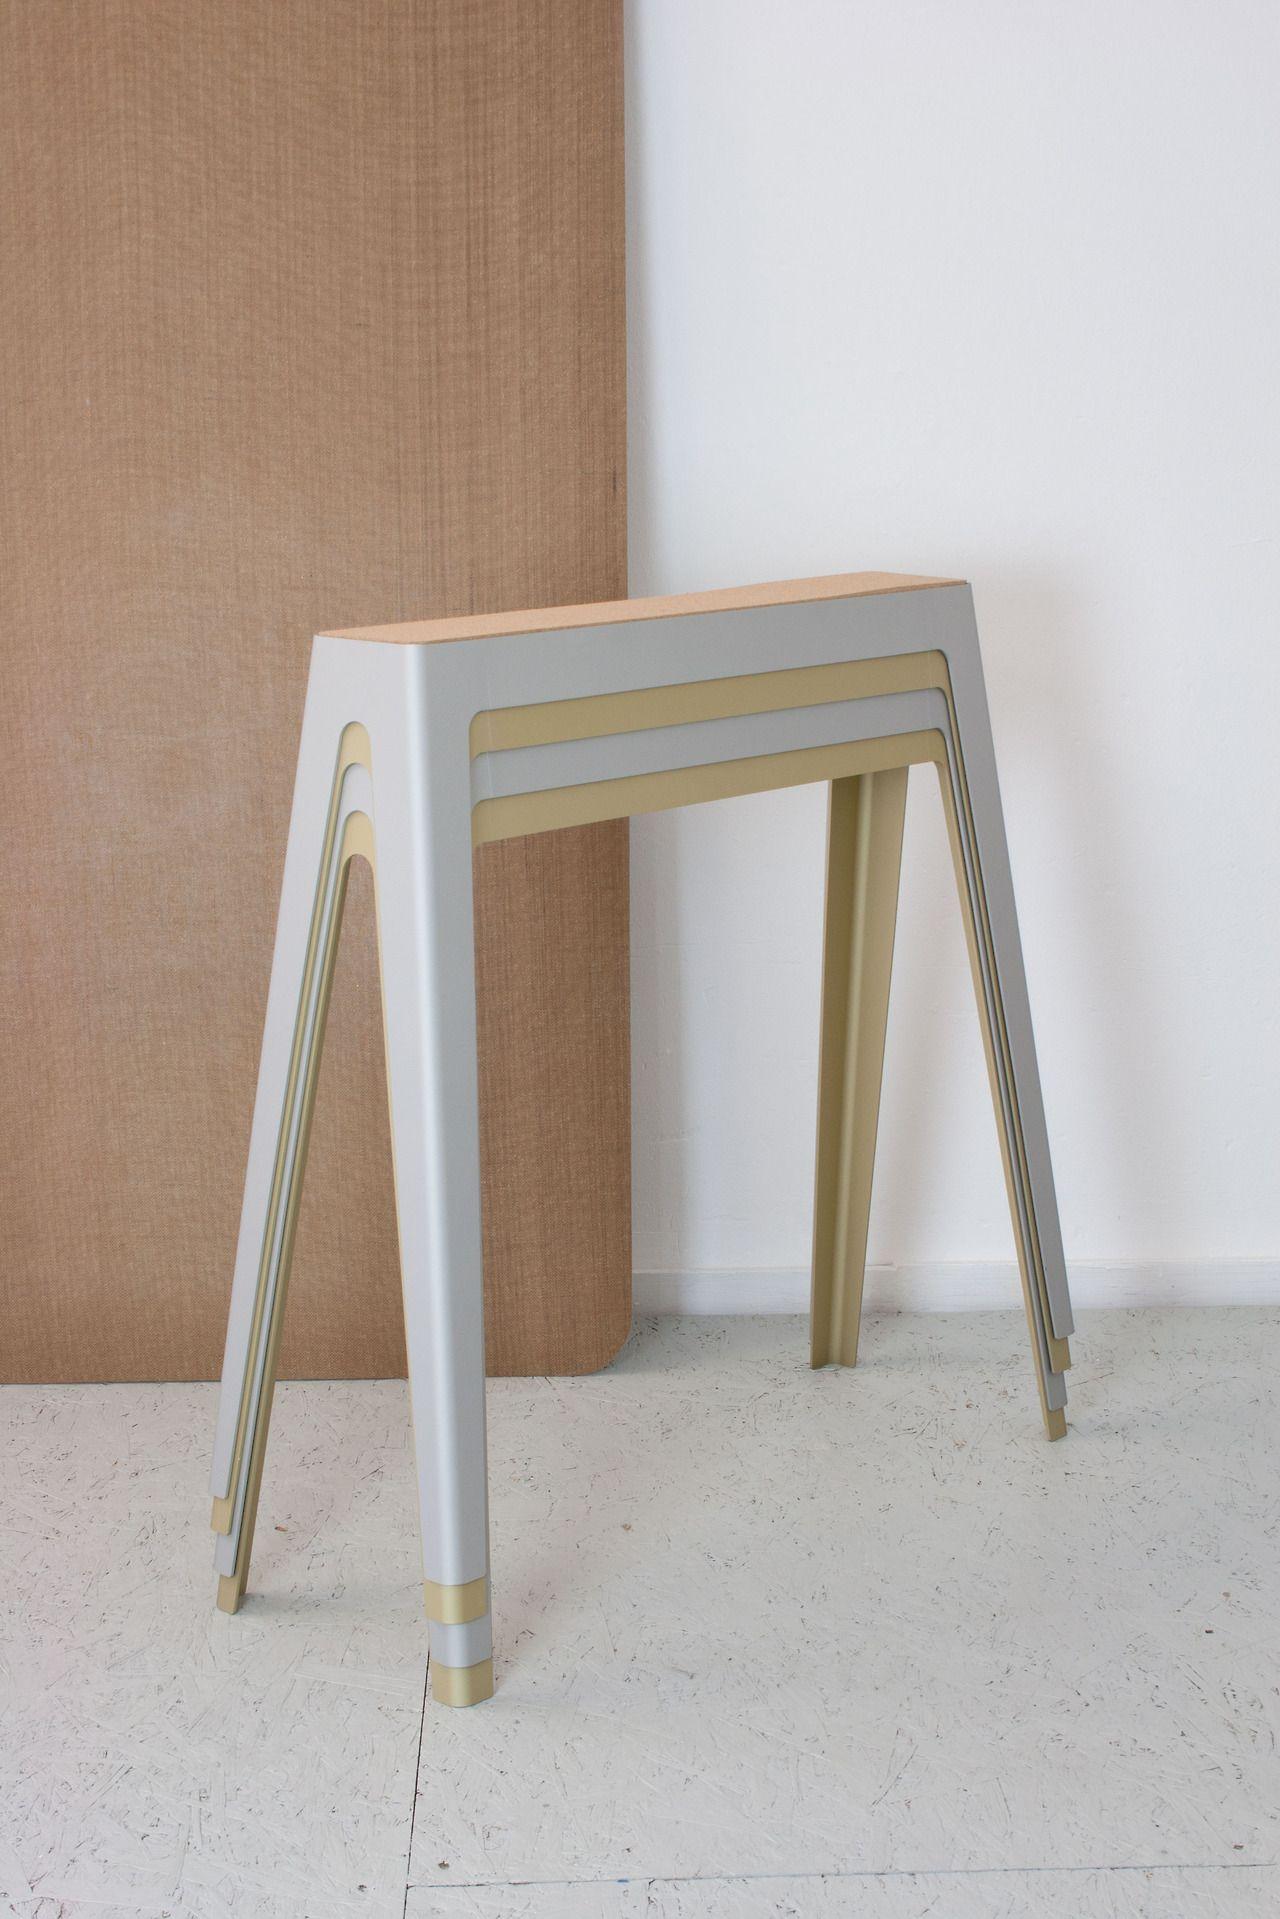 18a9846c5142eab3fab6e28049347780 Impressionnant De Table Transformable Concept